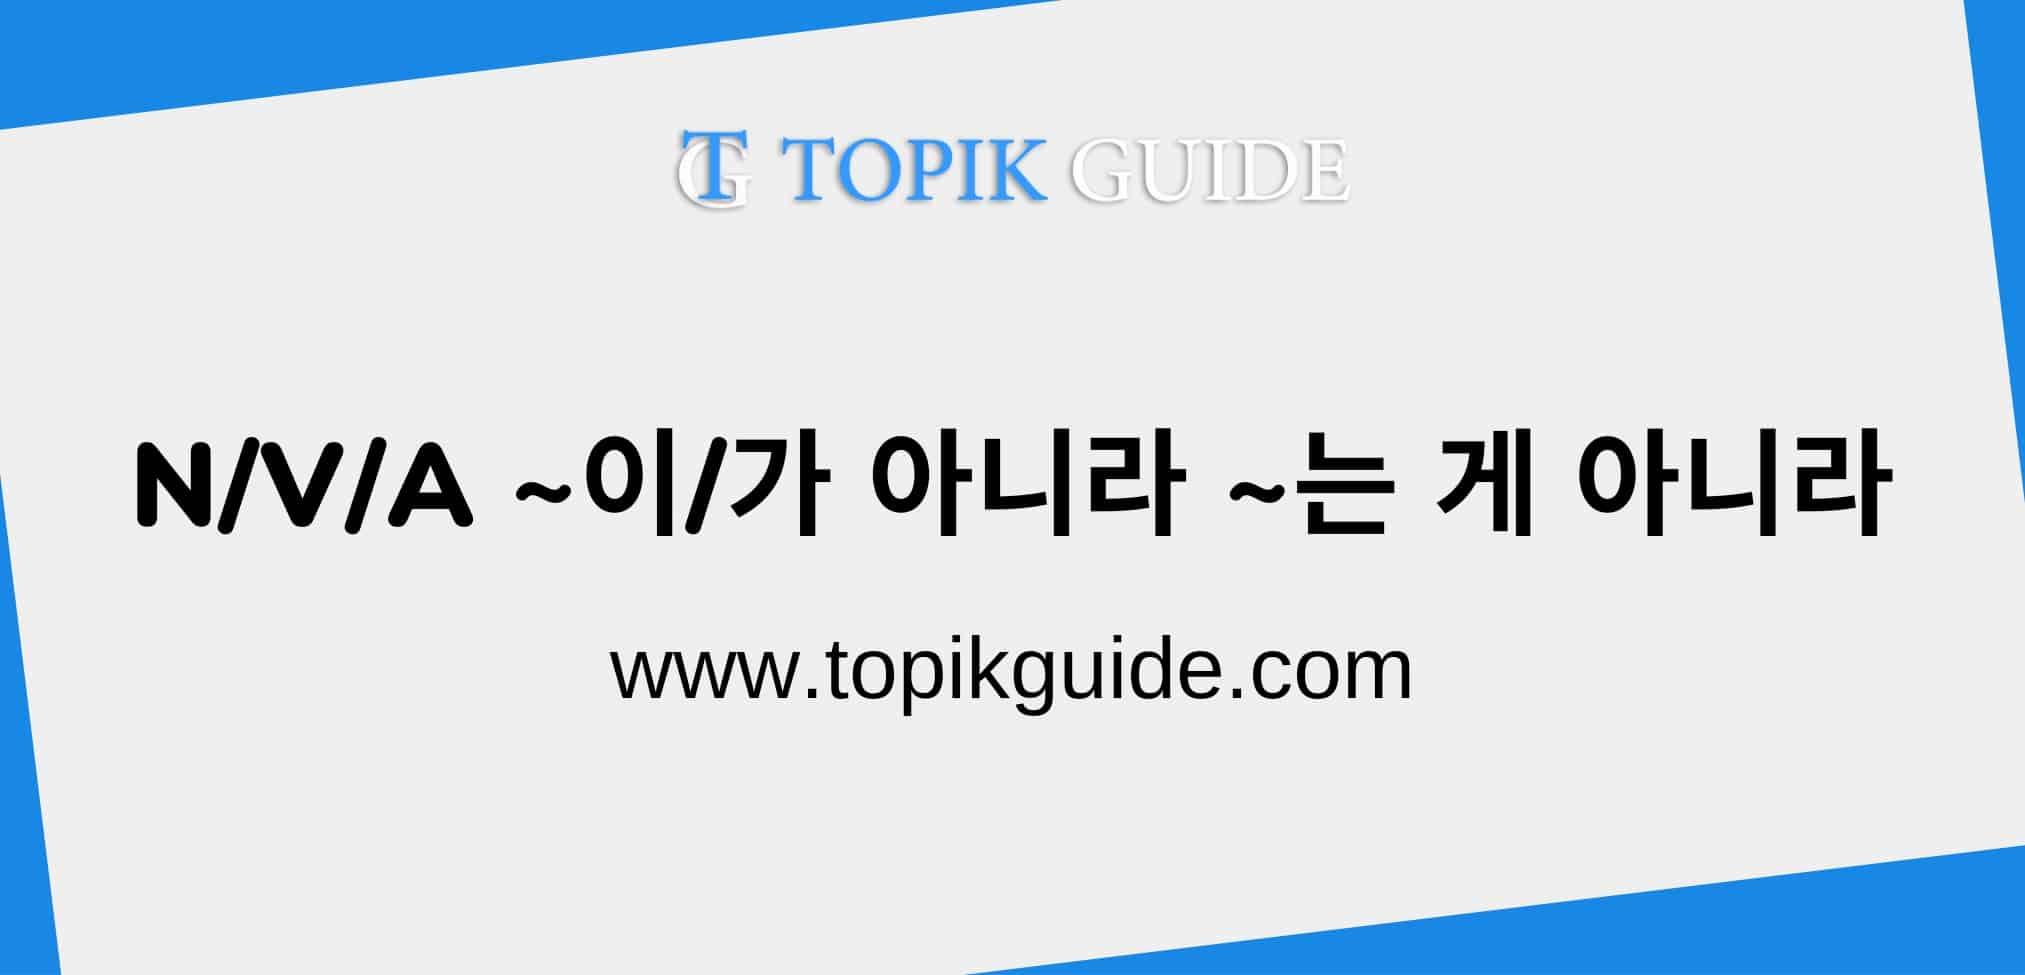 N/A/V ~이/가 아니라 ~는 게 아니라 [ Korean Grammar ]